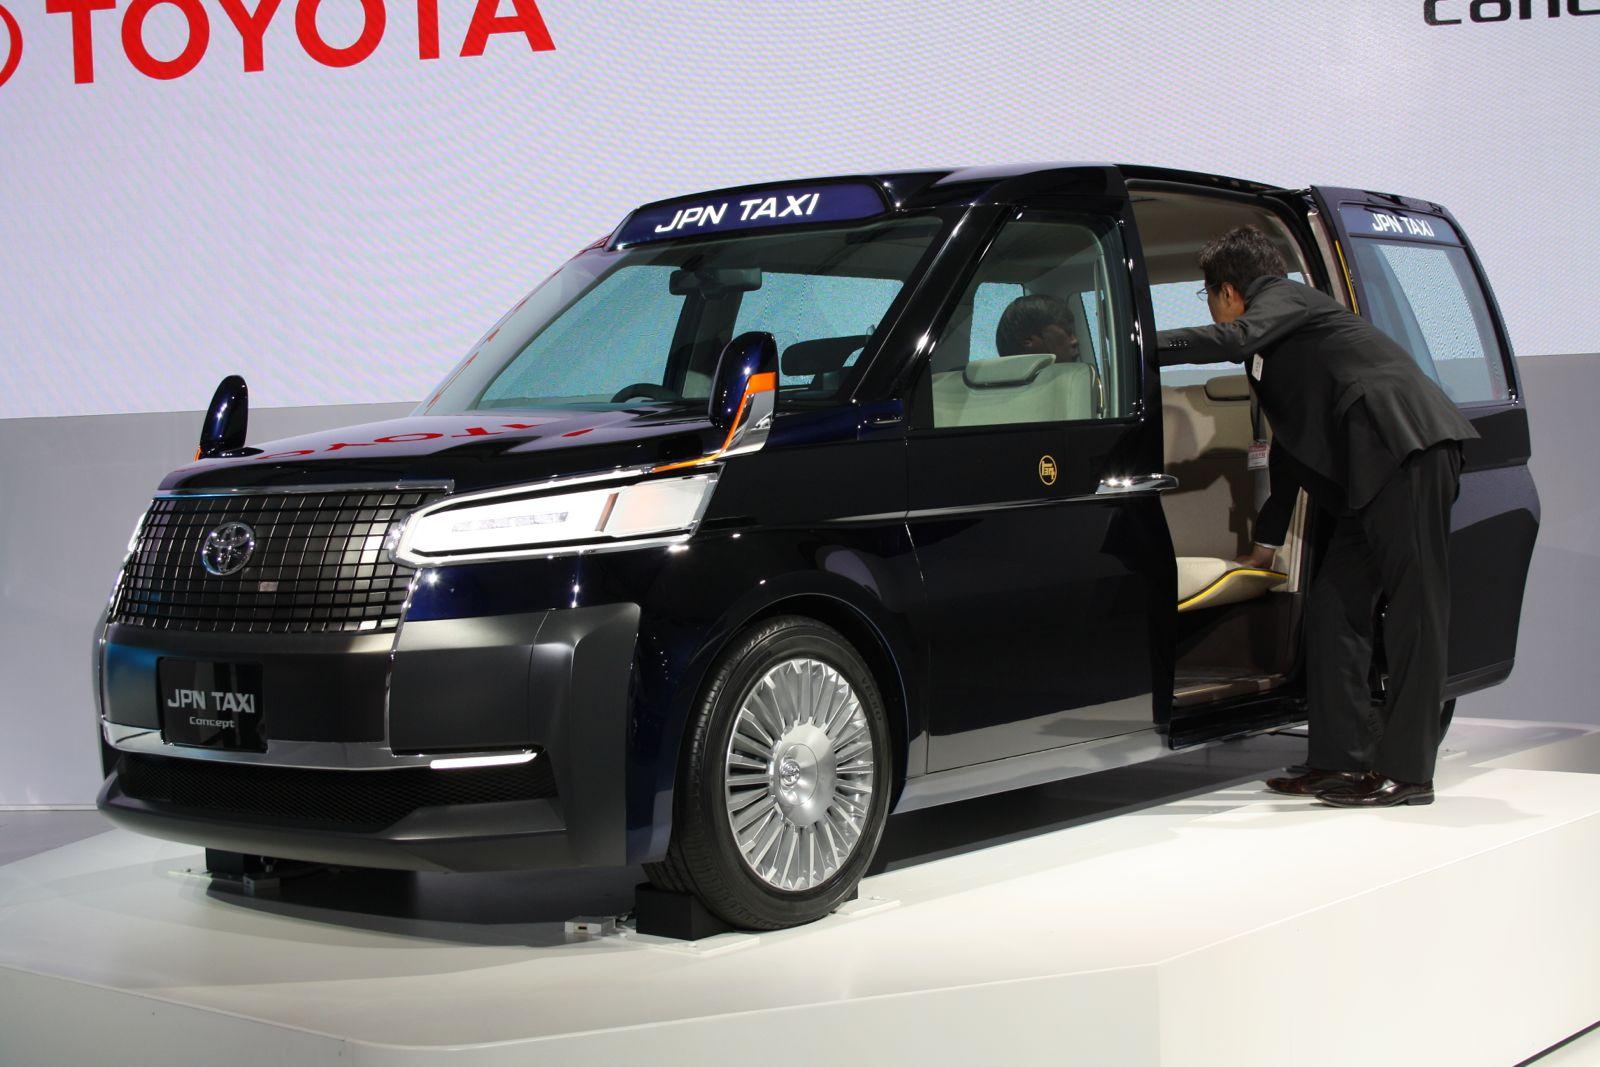 2013 Tokyo Motor Show Live Toyota Jpn Taxi Concept